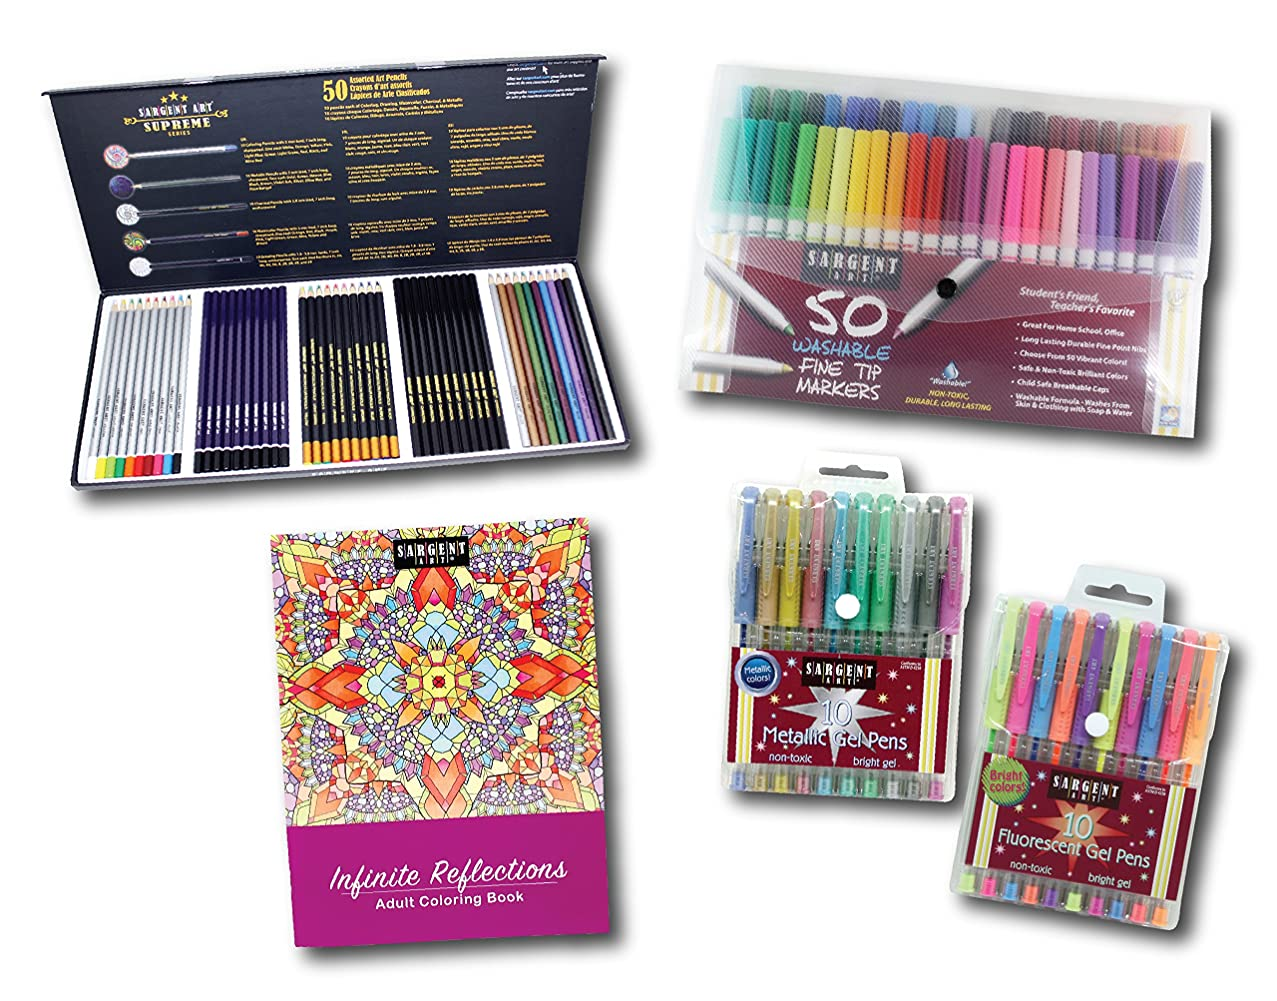 Sargent Art 22-0048 Advanced Artist Kit 5 Piece Art Activity Set, Pencils, Markers, Gel Pens, Coloring Book